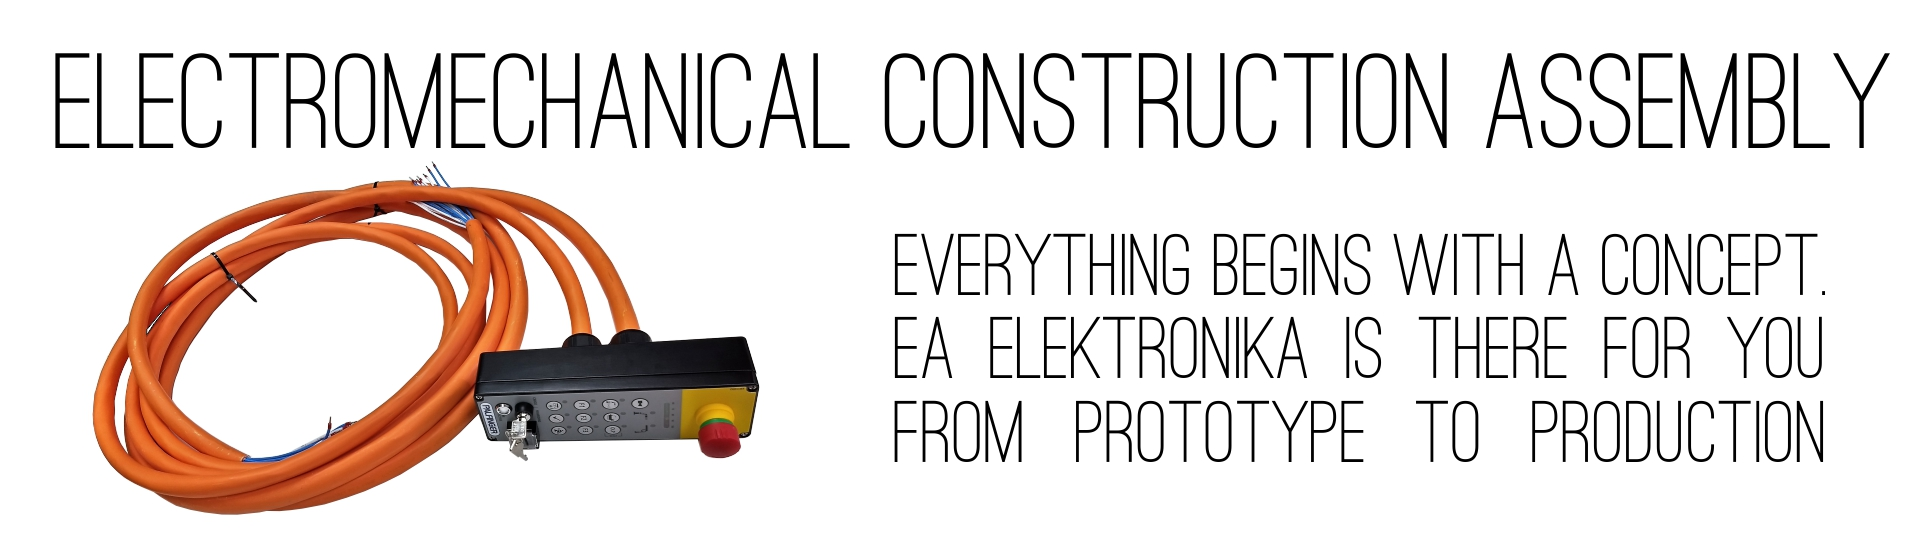 Ea Elektronika Ltd Industrial Electronics Alternative Energy Electronic Wiring Environment